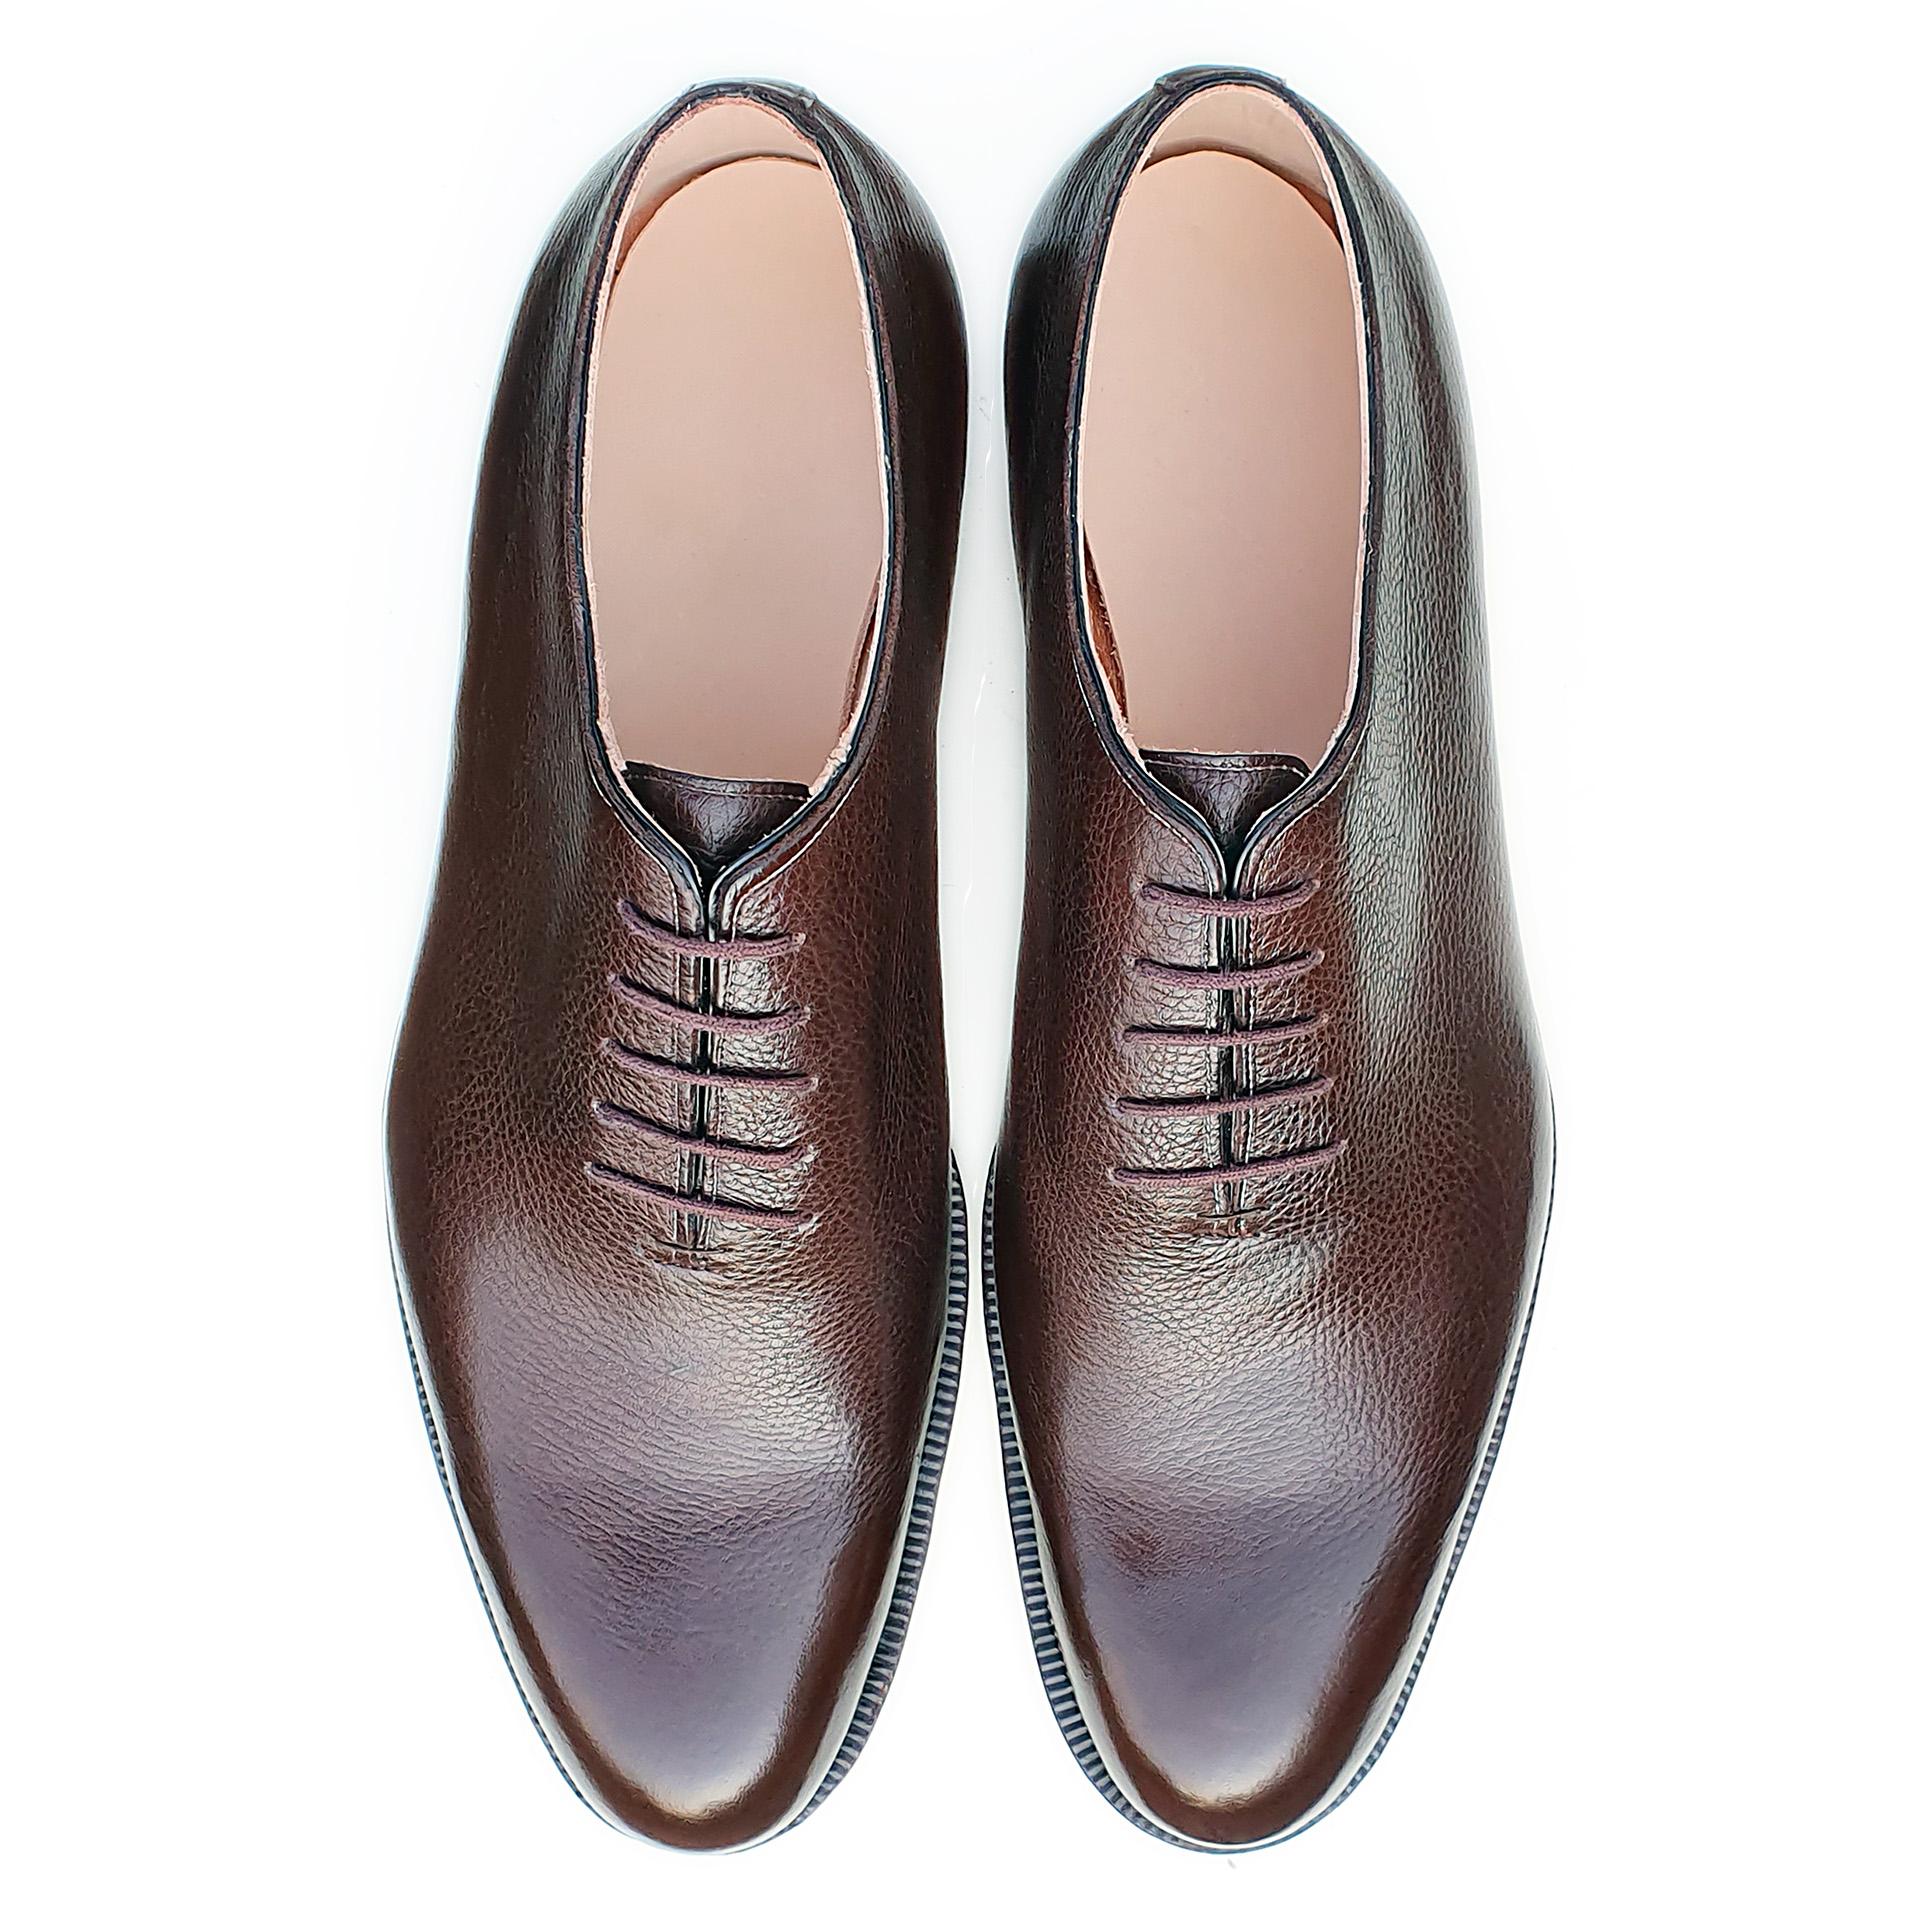 Björn wholecut shoe